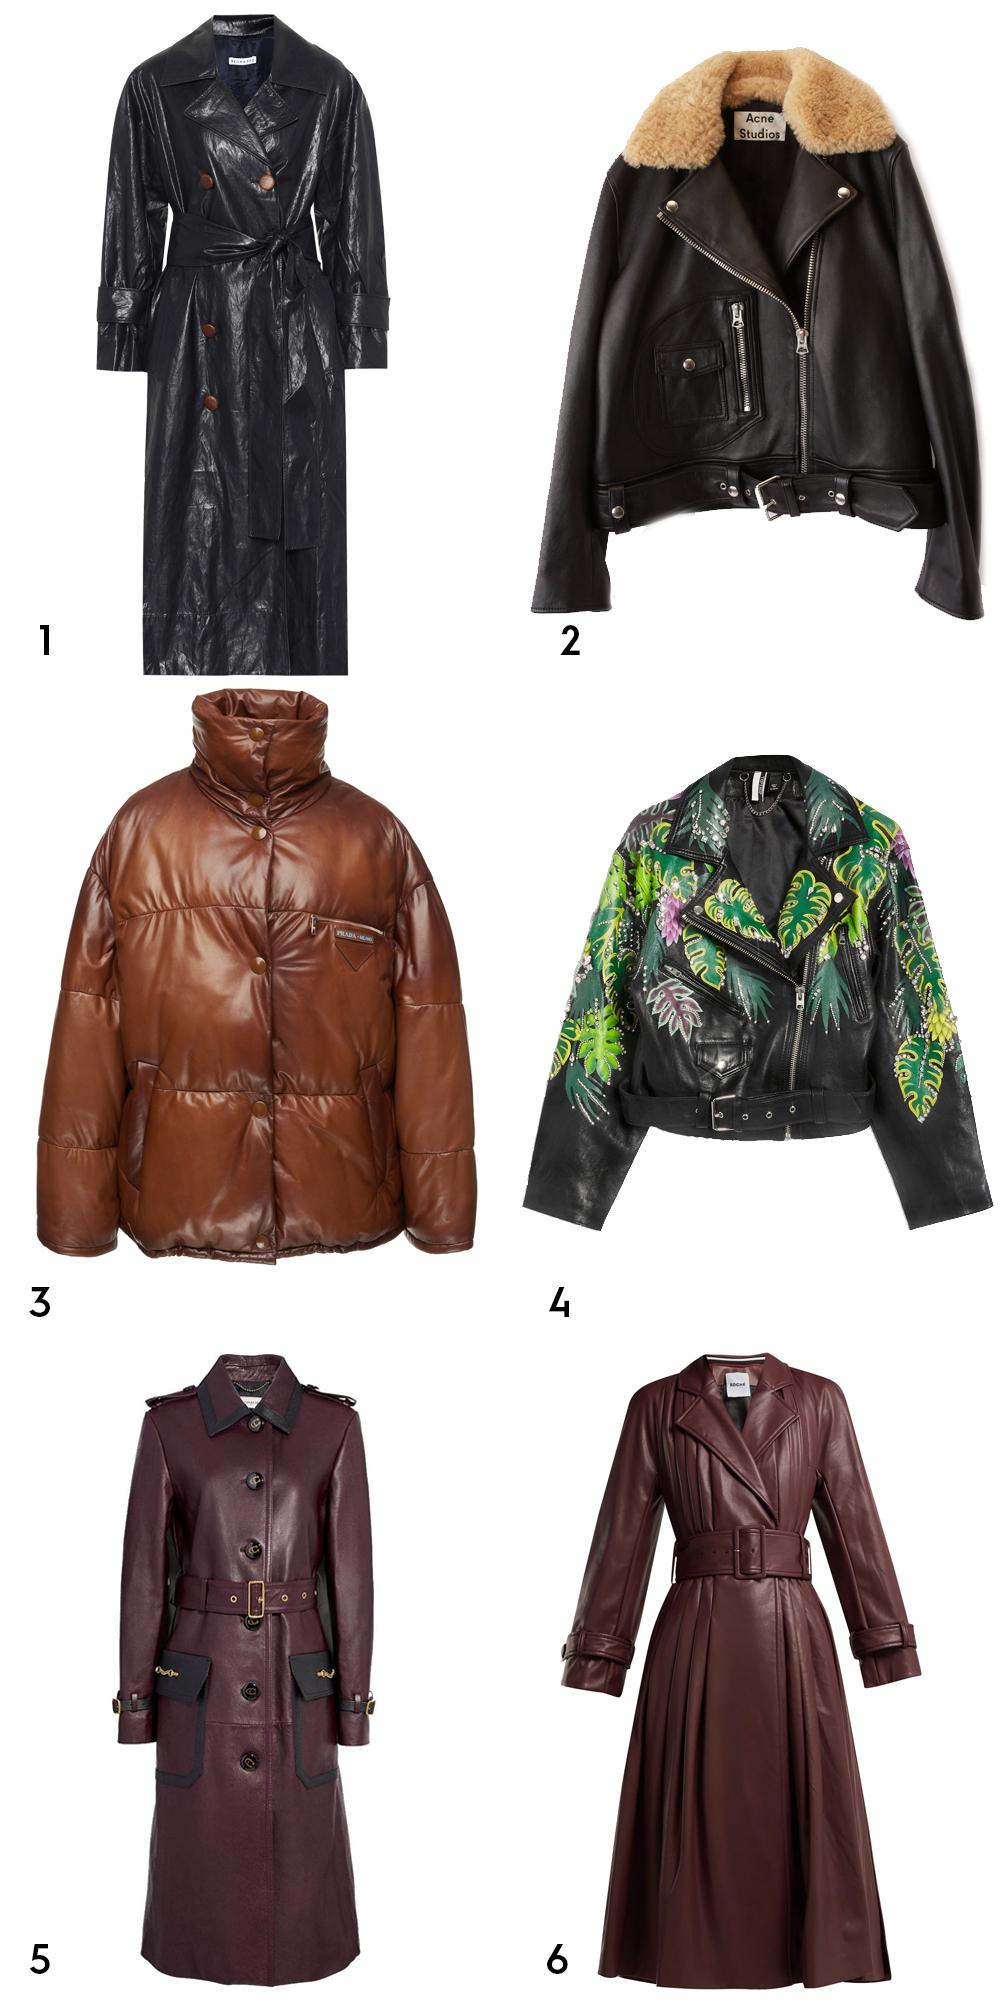 1 Oli faux leather trench coat by Regina Pyo, €807.84 at mytheresa.com, 2 boxy biker jacket black, €2223.35 at acnestudios.com, 3leather puffer coat by Prada, €3,291 at modaoperandi.com, 4jungle embellished jacket, €390 at topshop.com, 5Western leather trench coat, €1,503.95 atcoach.com,6 belted faux-leather trench coat by Koché, €1,632 at matchesfashion.com